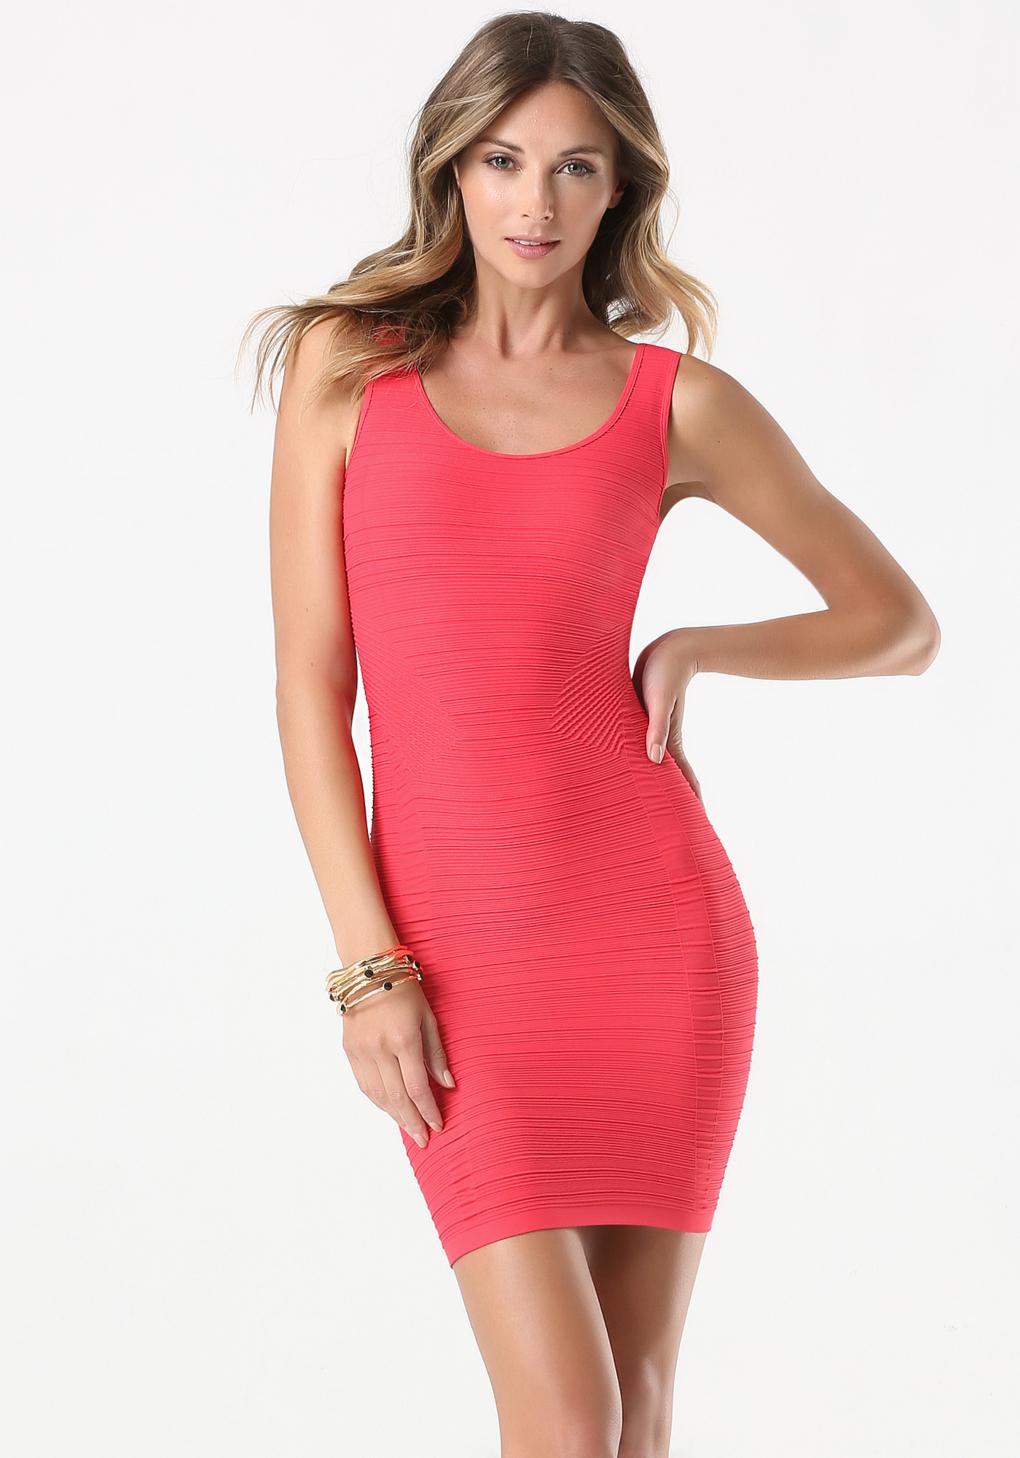 lyst bebe textured tank dress in pink. Black Bedroom Furniture Sets. Home Design Ideas